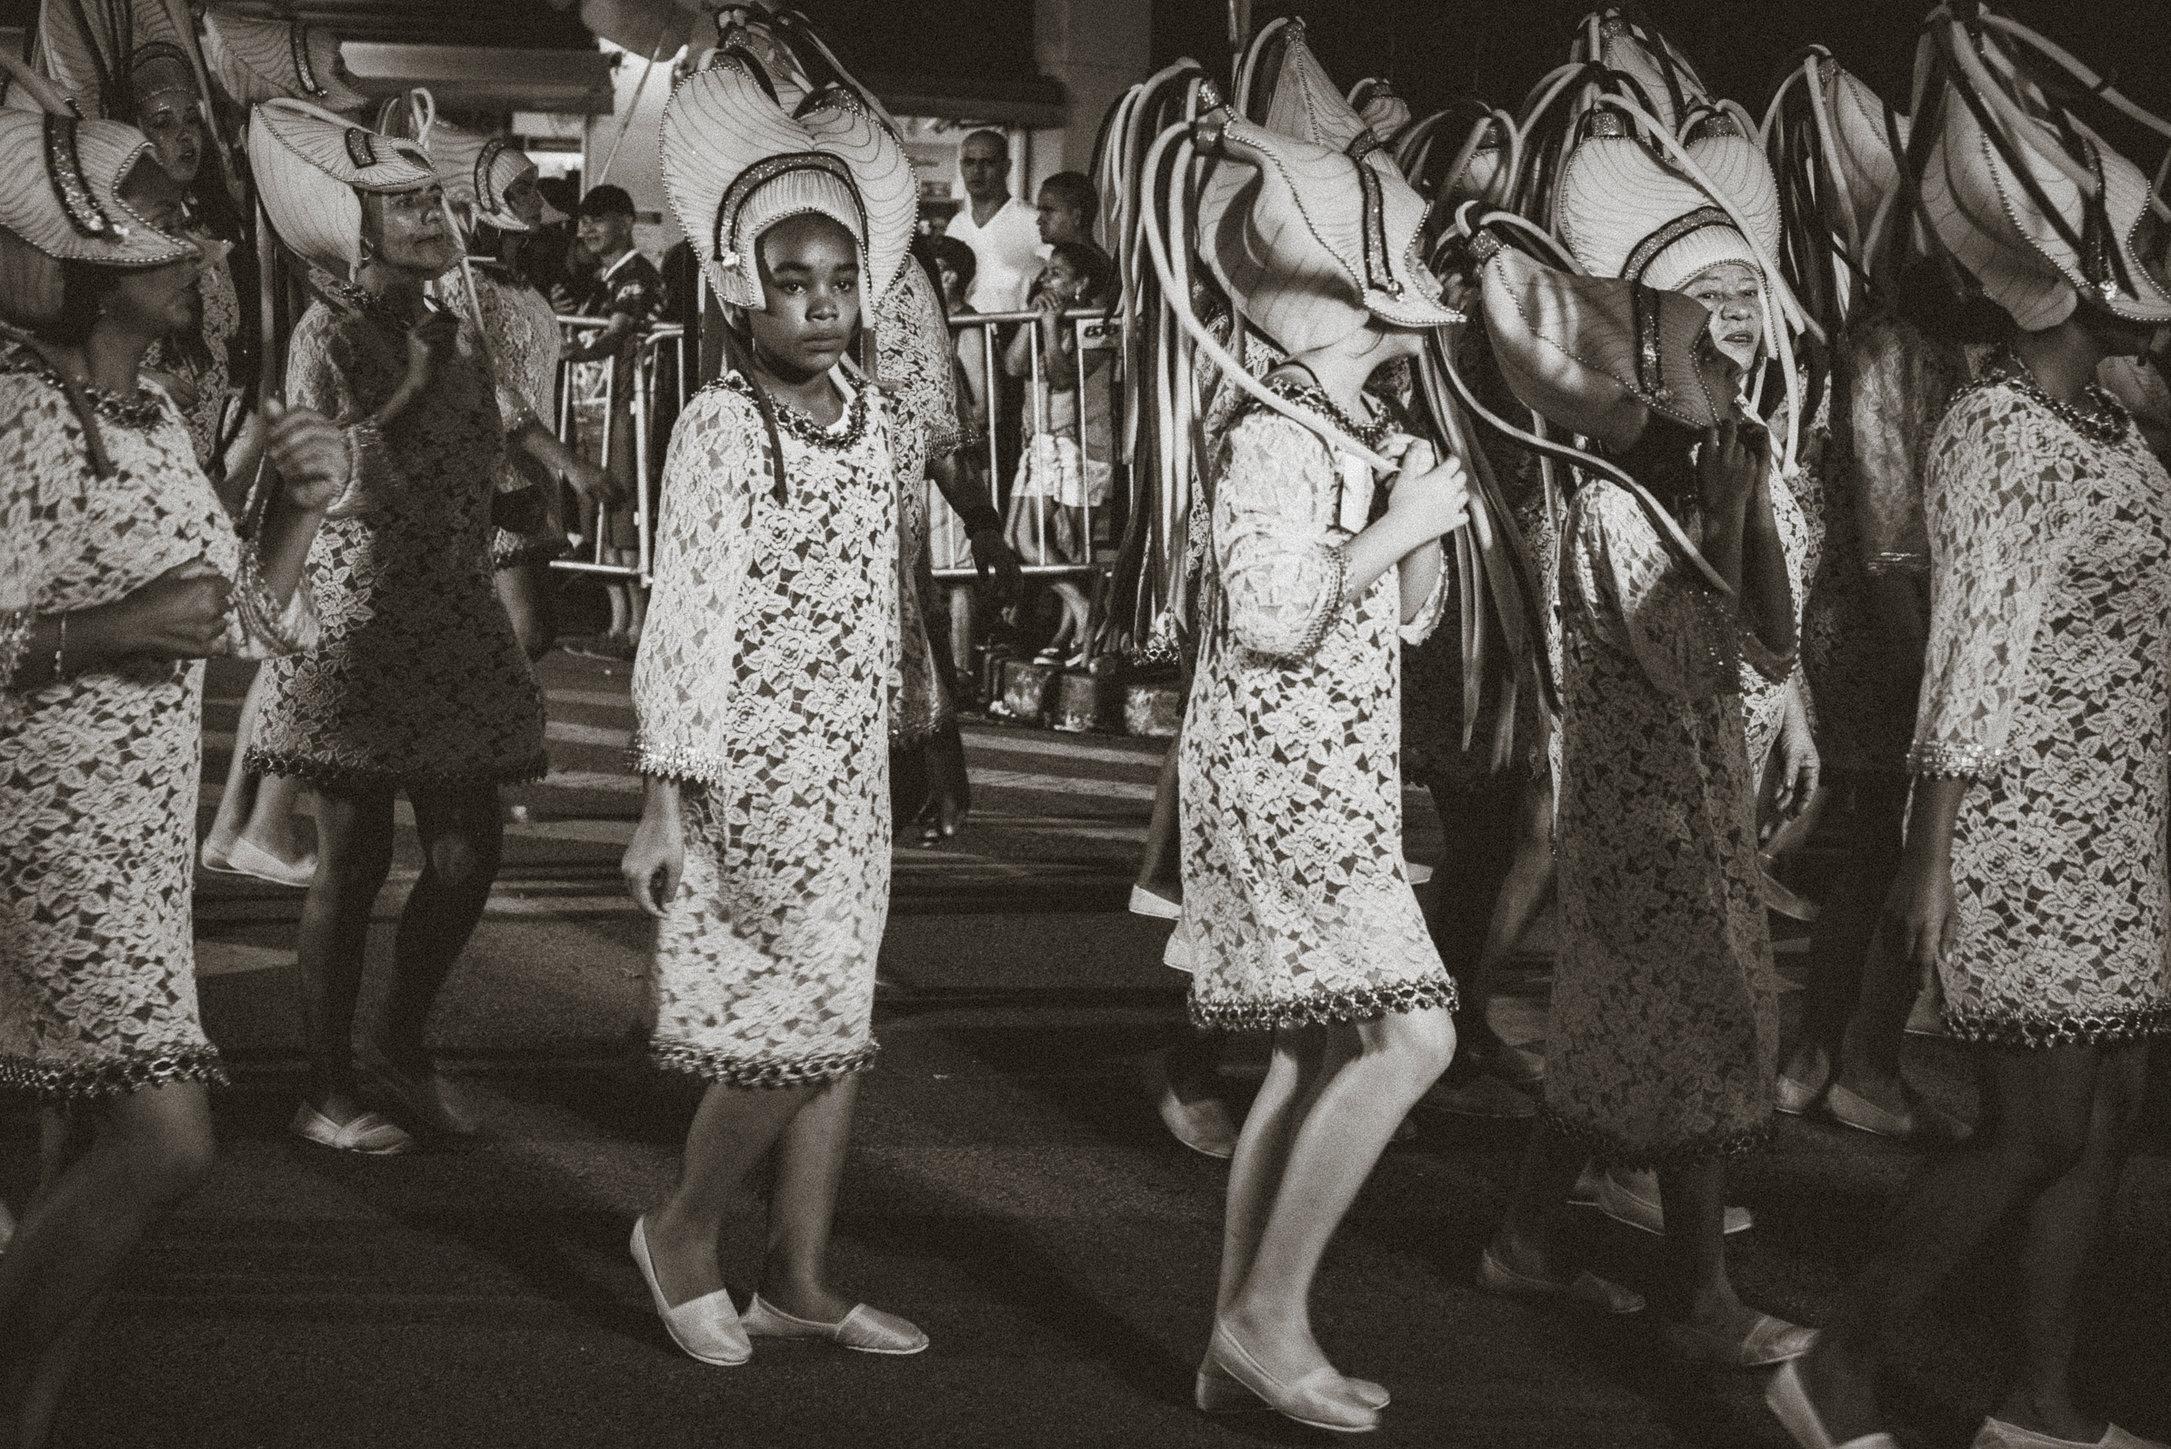 20180212-Carnaval-43.jpg